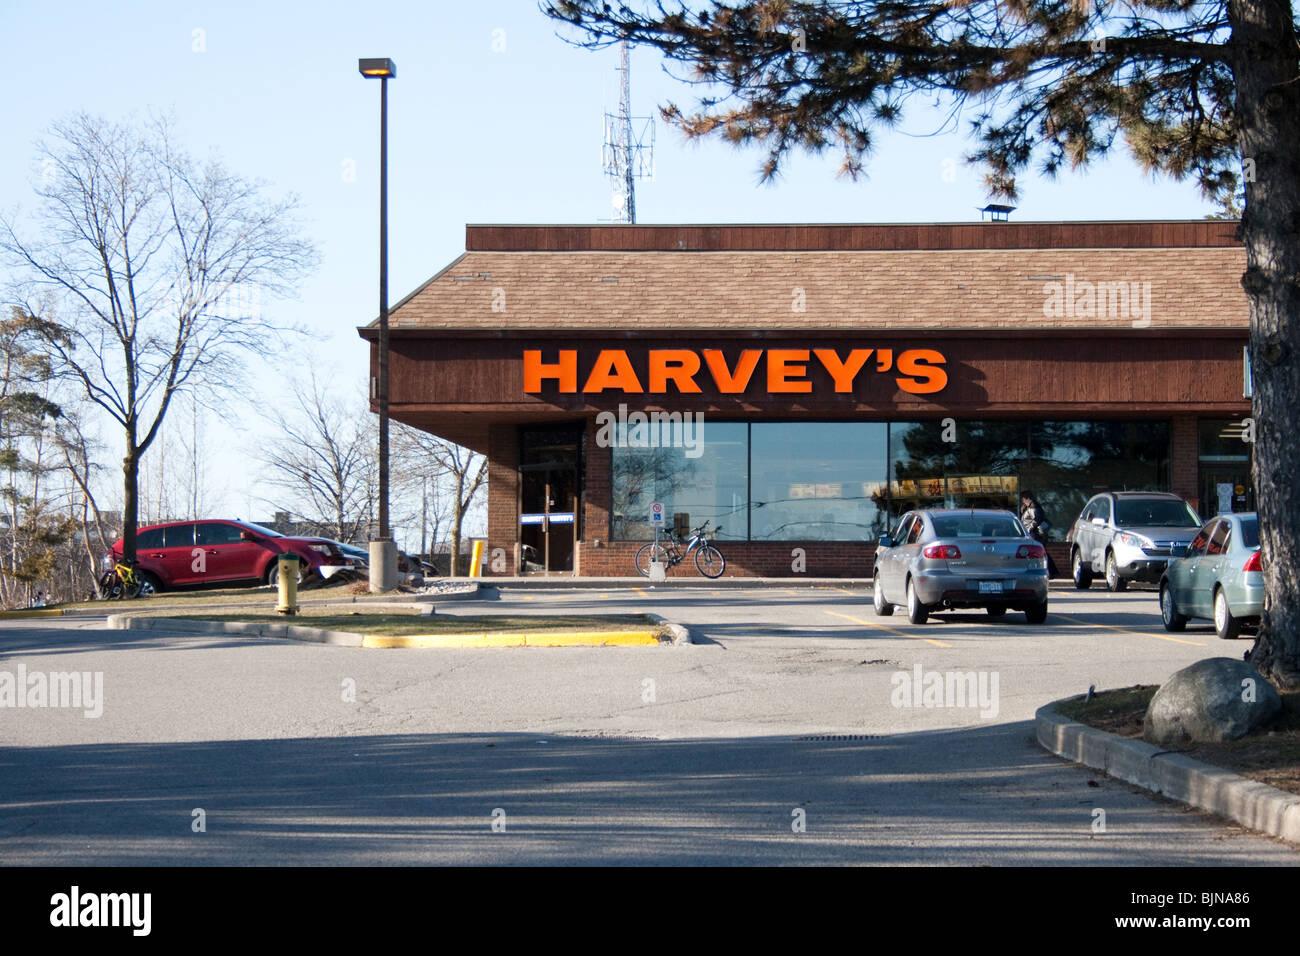 harvey harvey's harveys fast food burger restaurant unhealthy fries coke oily fat mcdonald burger king cheap - Stock Image